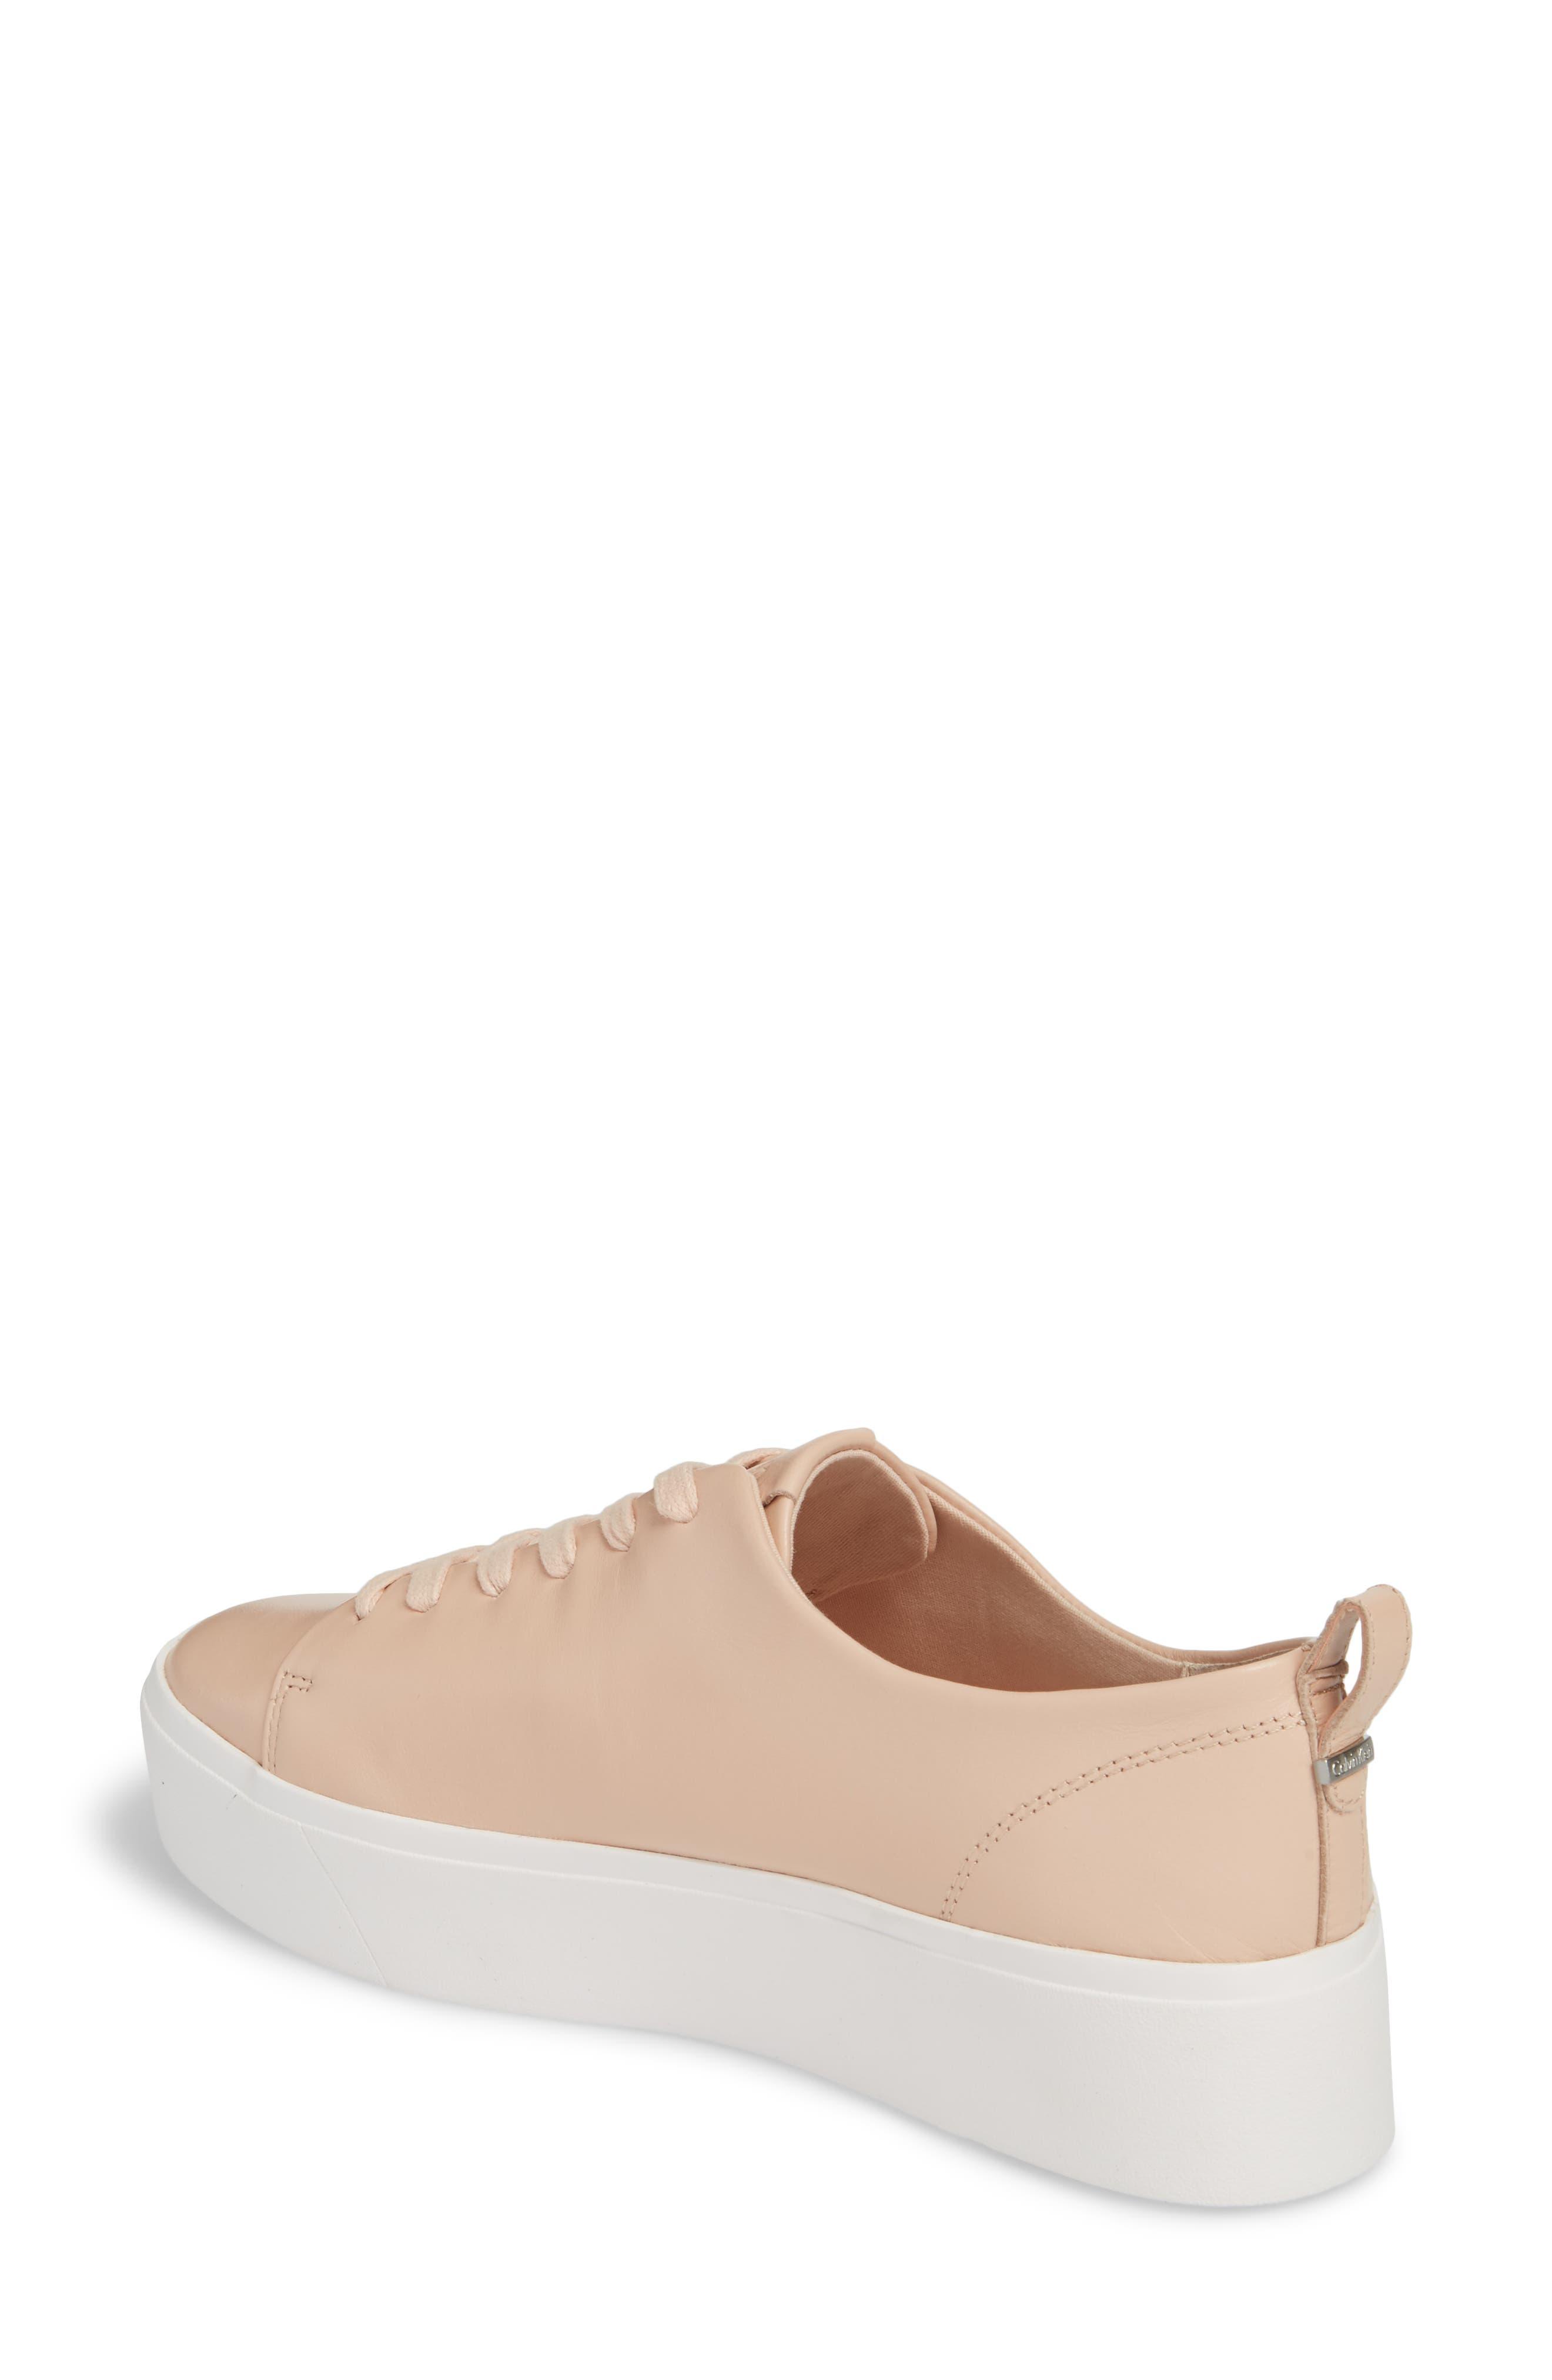 Janet Platform Sneaker,                             Alternate thumbnail 4, color,